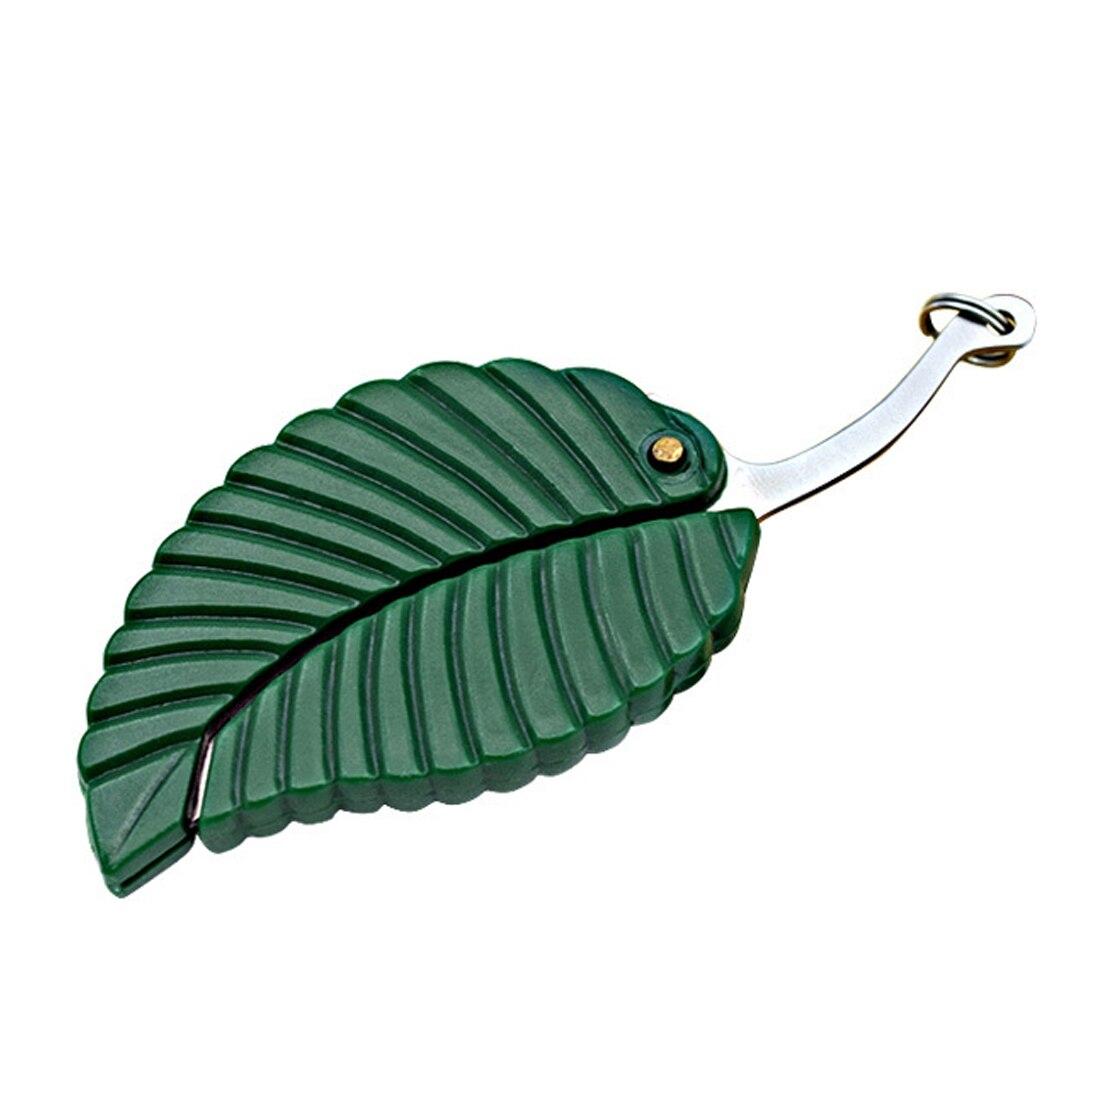 1pcs Green Mini Fold Leaf Shape Pocket Knife Folding Keychain Knife Outdoor Camp Knife camping equipment1pcs Green Mini Fold Leaf Shape Pocket Knife Folding Keychain Knife Outdoor Camp Knife camping equipment